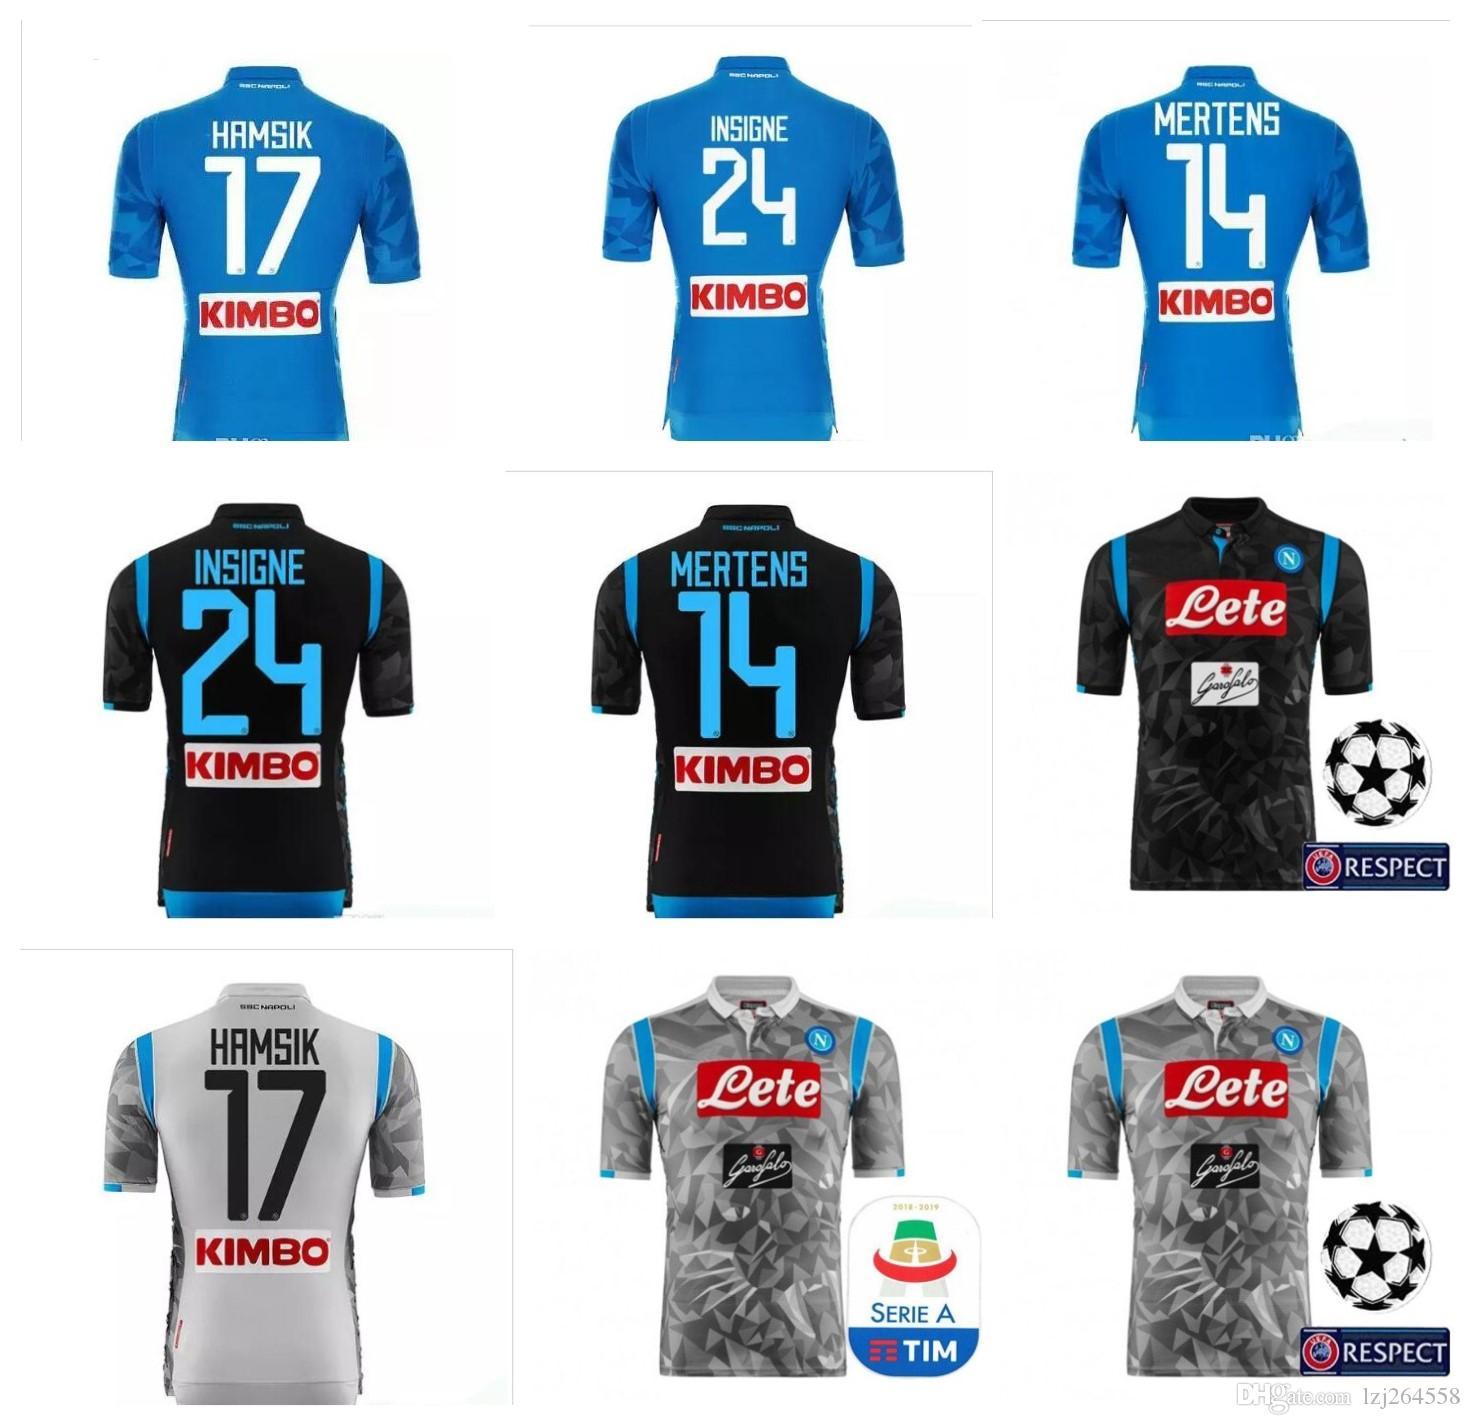 d9447f87cdcbf Nueva Camiseta Napoli Jersey 2018 De Fútbol Camiseta De Fútbol Hamsik  Maradona Uniforme Callejon Mertens Insigne Descuento 18 19 TOP Thai Naples  2019 Por ...